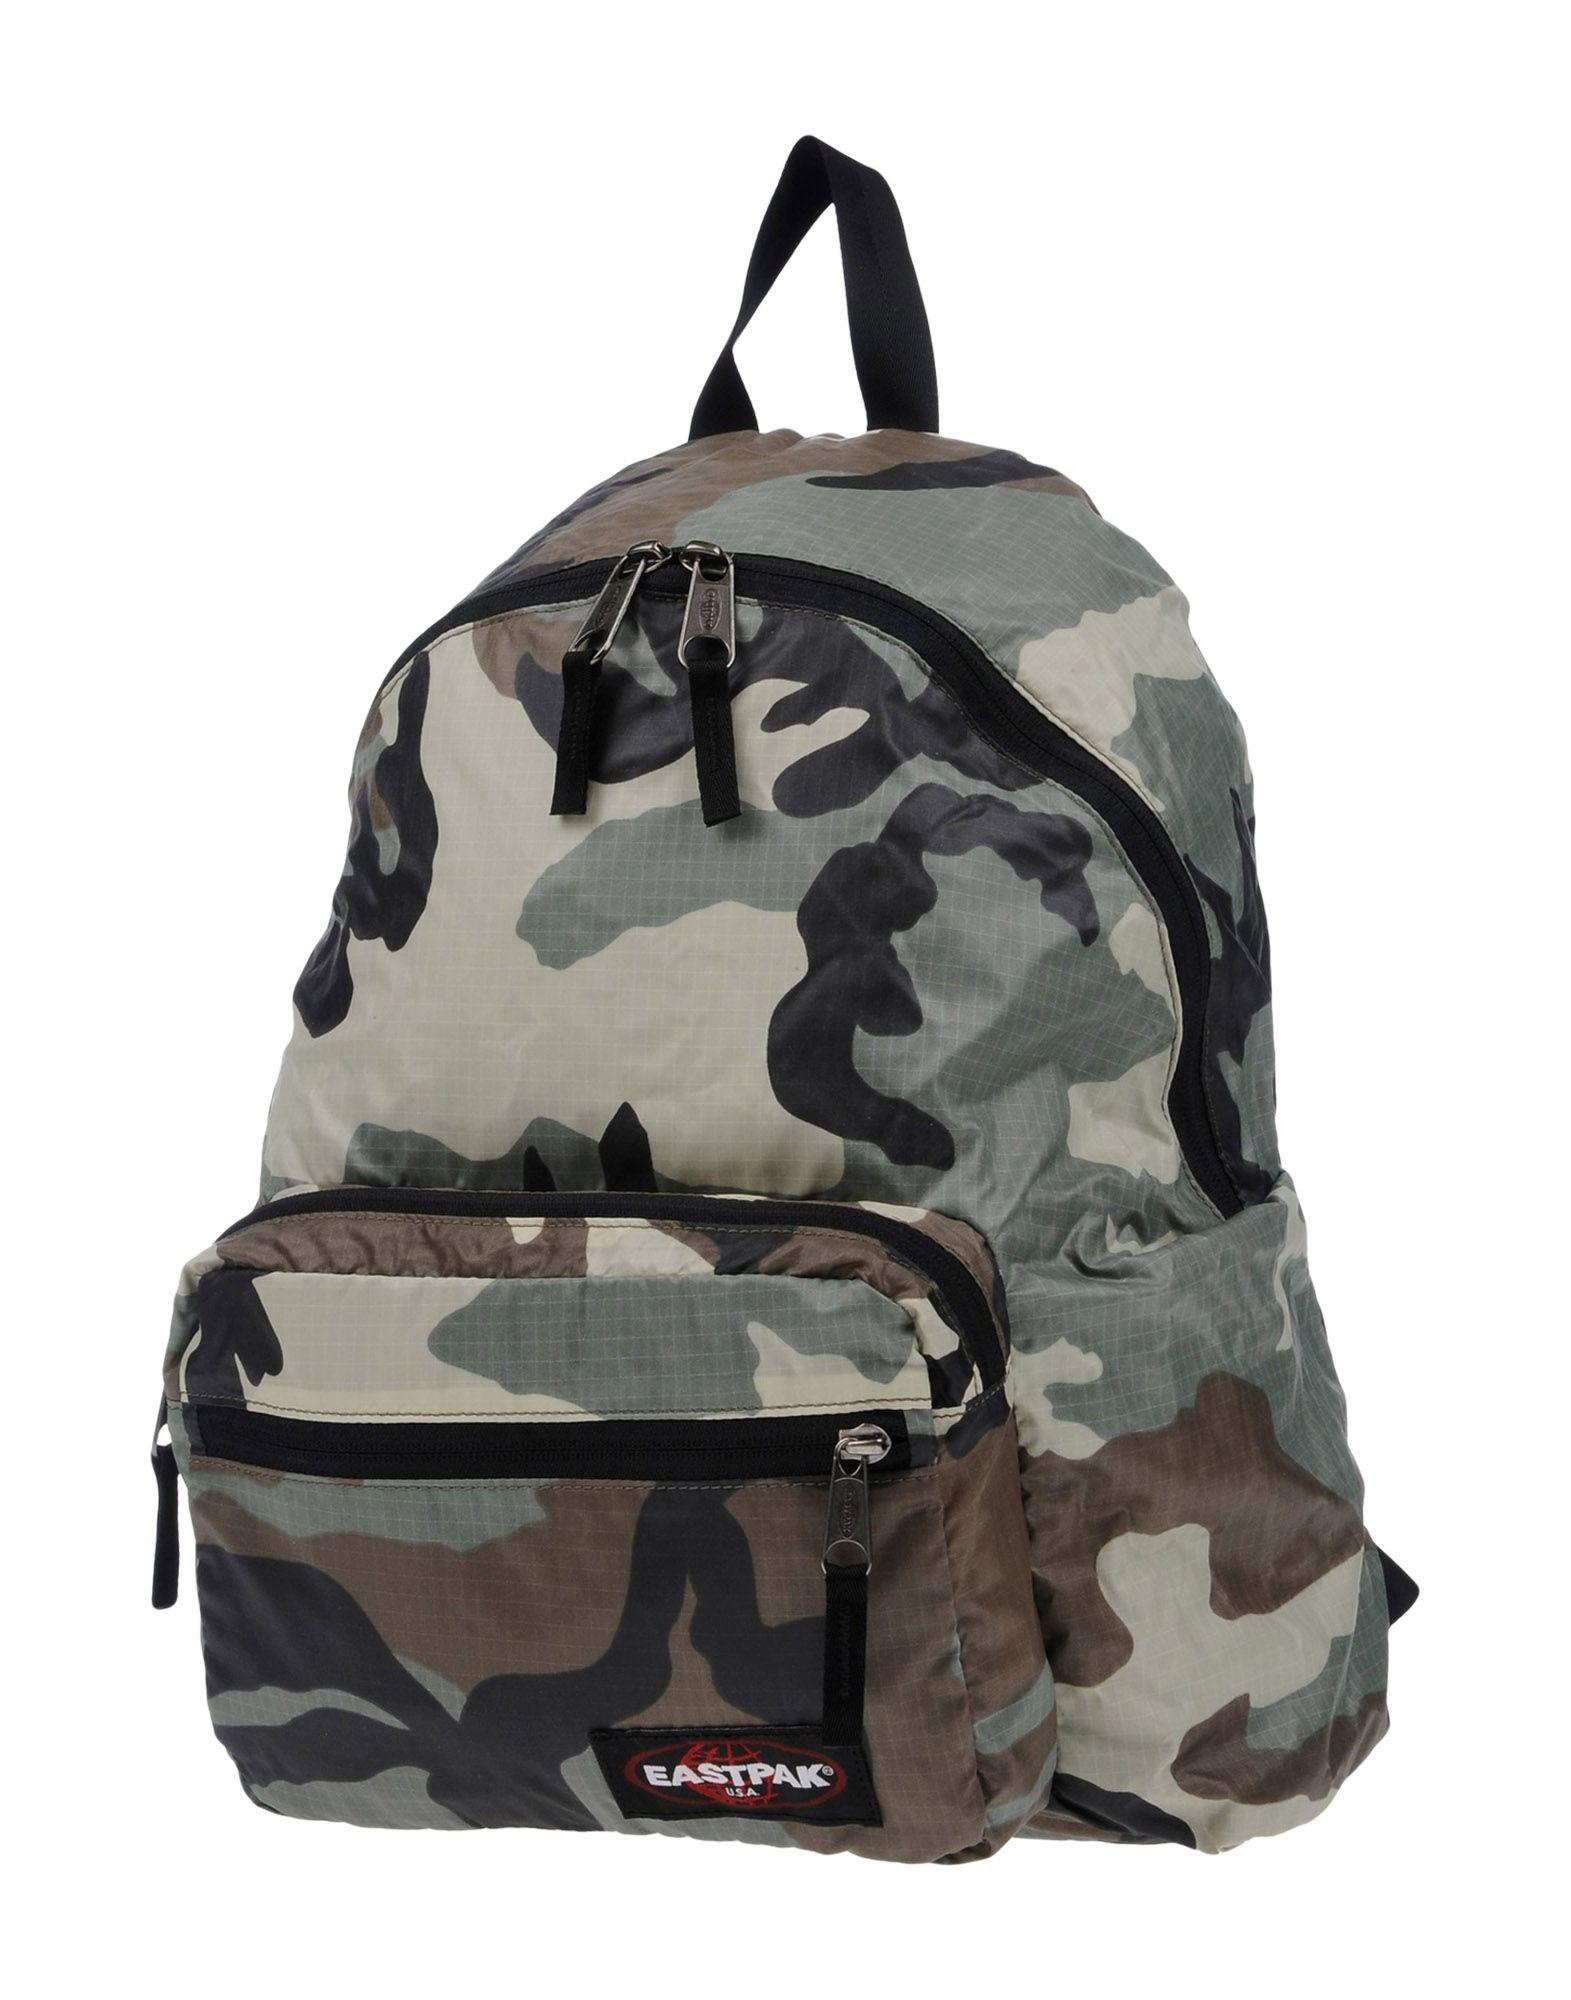 Eastpak Backpacks & Fanny Packs In Military Green